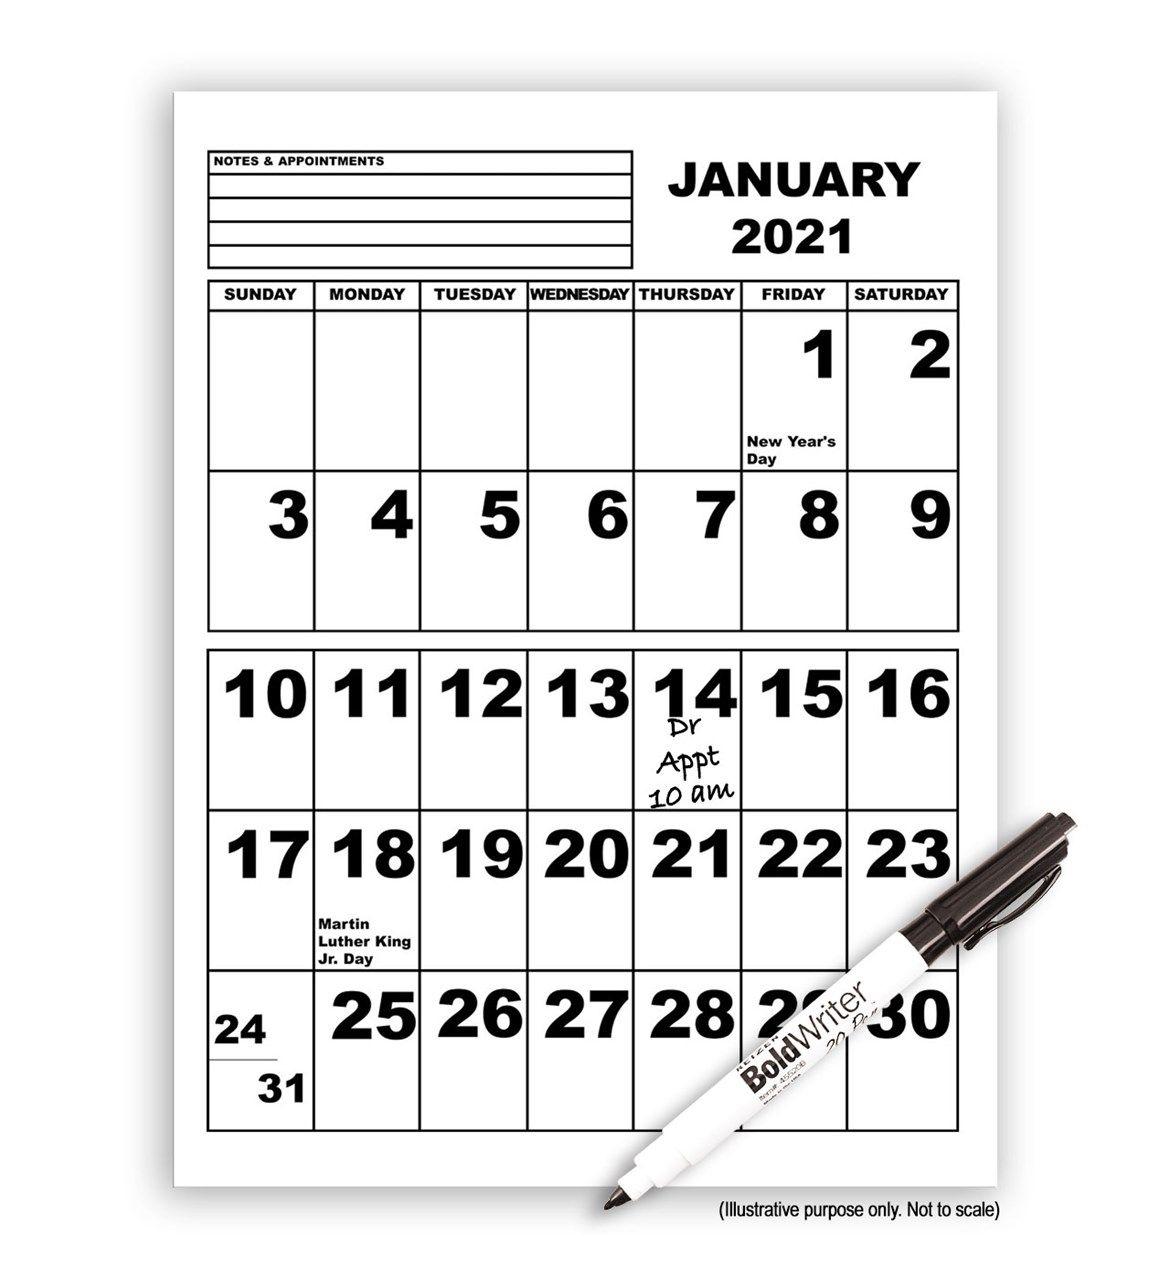 maxiaids   jumbo print calendar 2021 with boldwriter